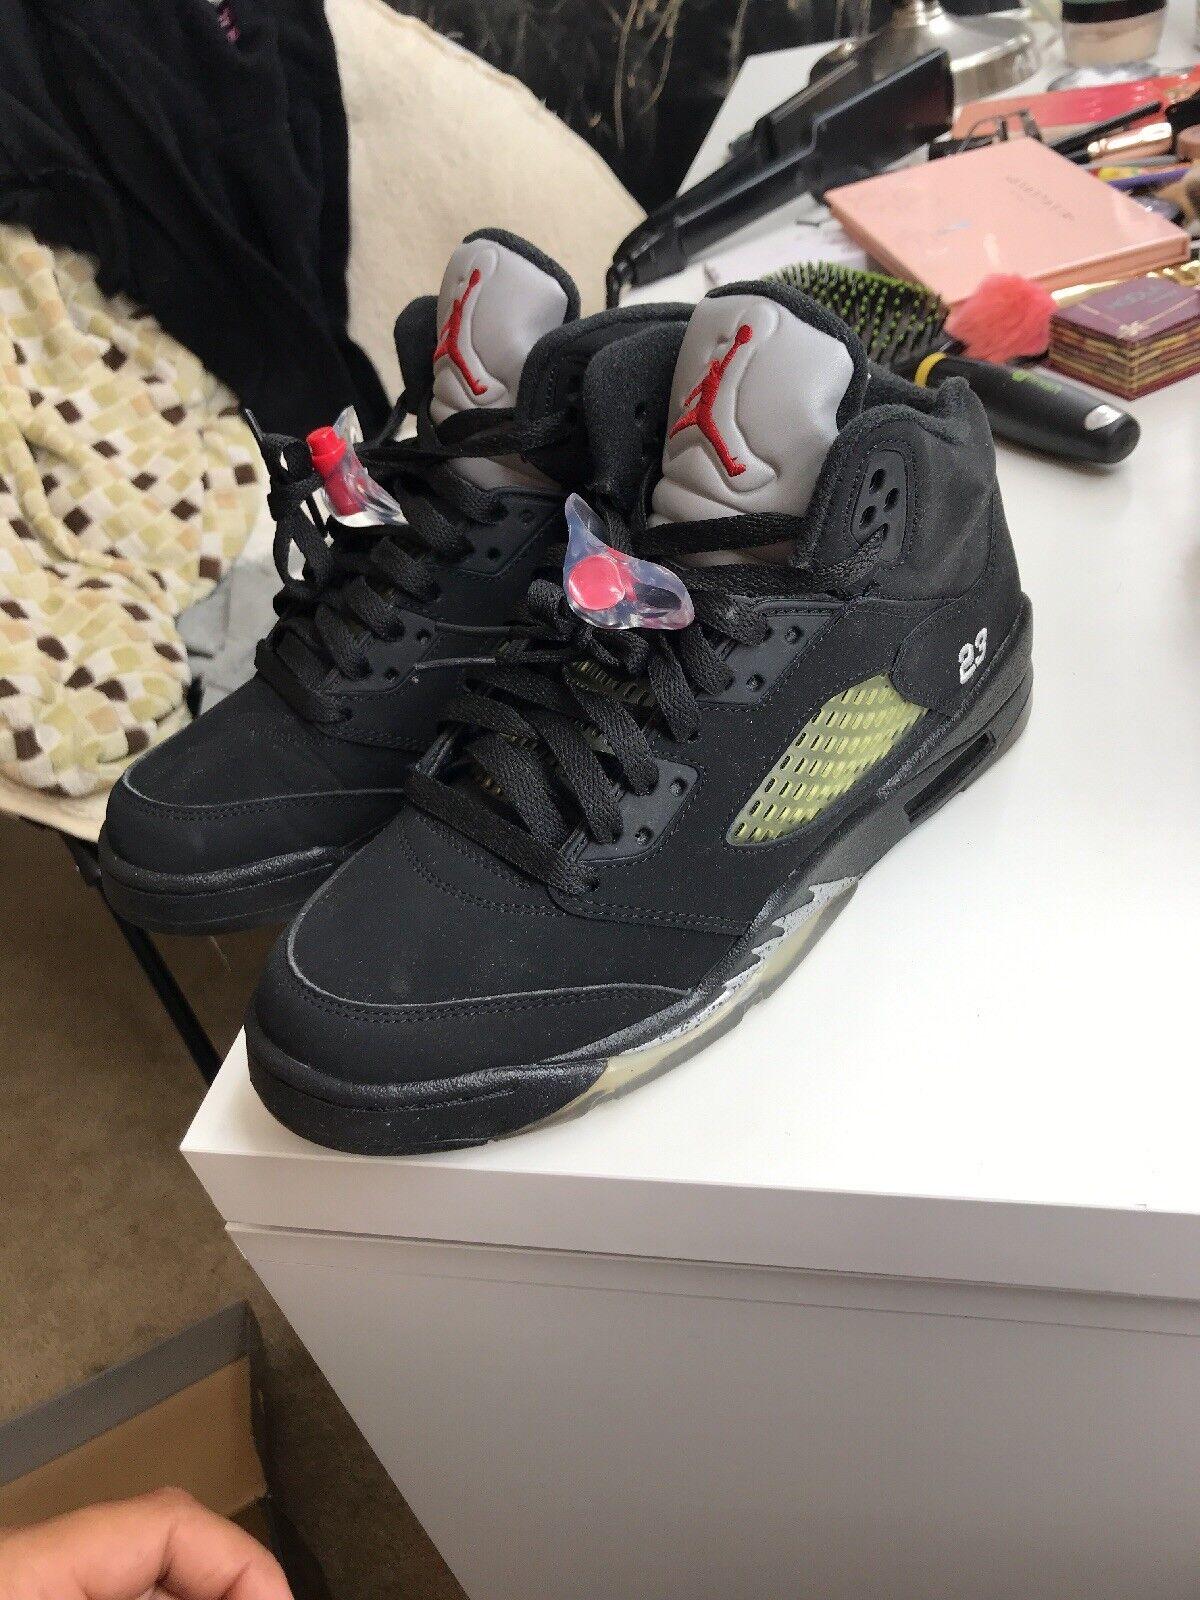 Air Jordan 5 Retro Metallic OG girls